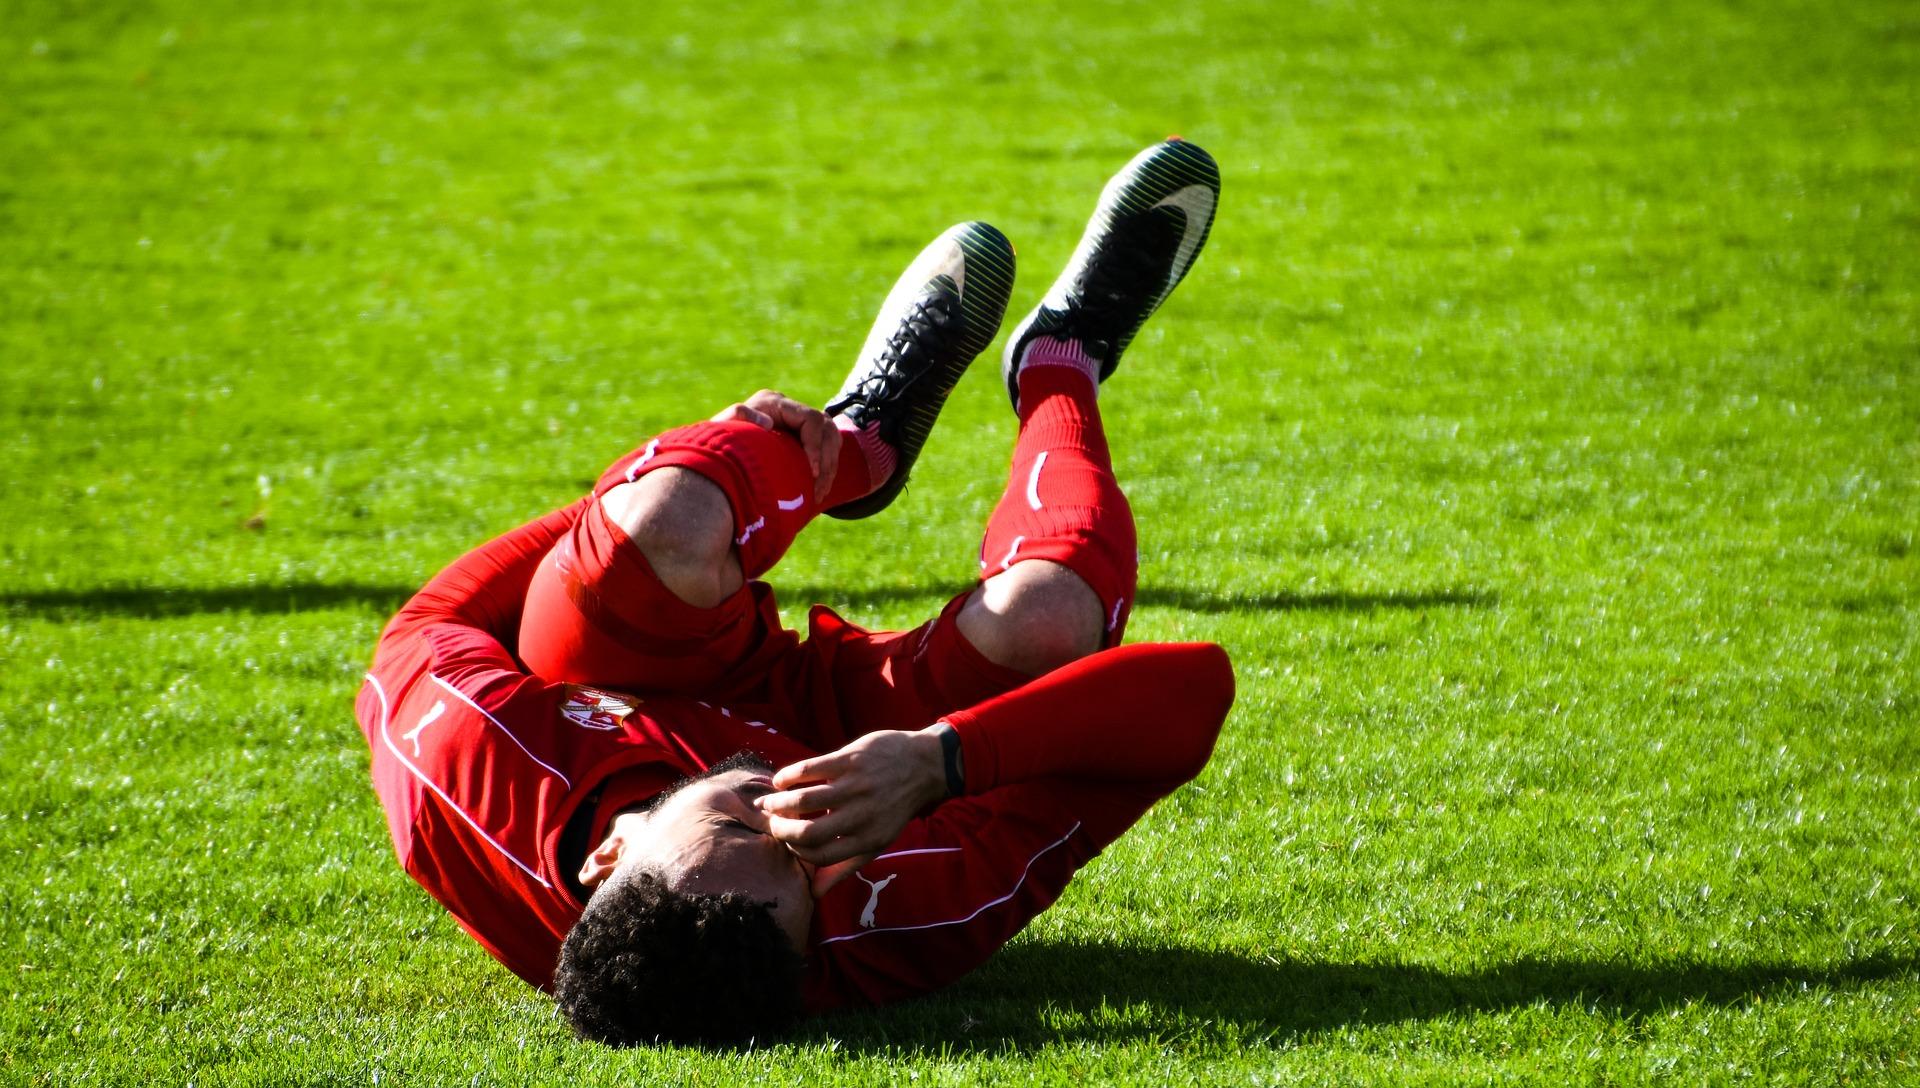 Footballer in pain